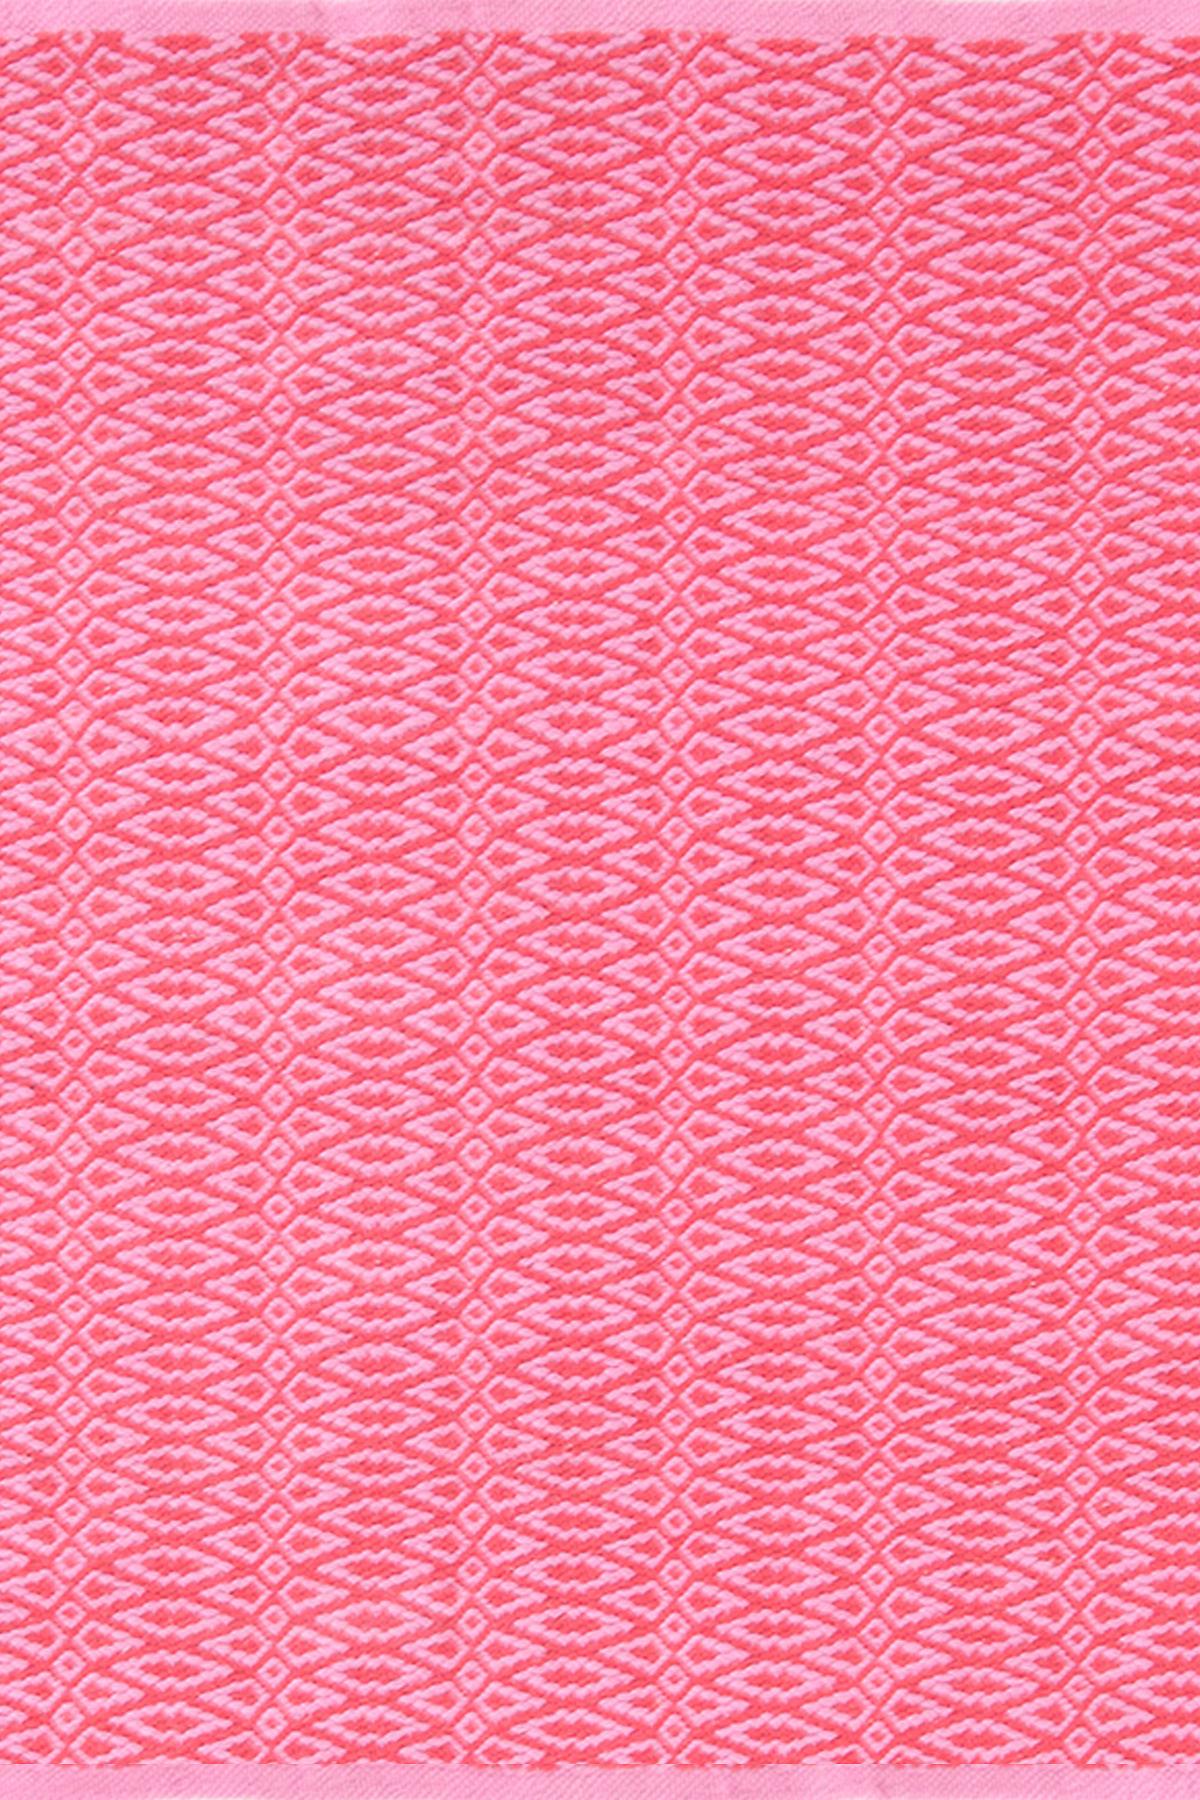 Fair Isle Pink/Fuchsia Cotton Woven Rug | The Outlet